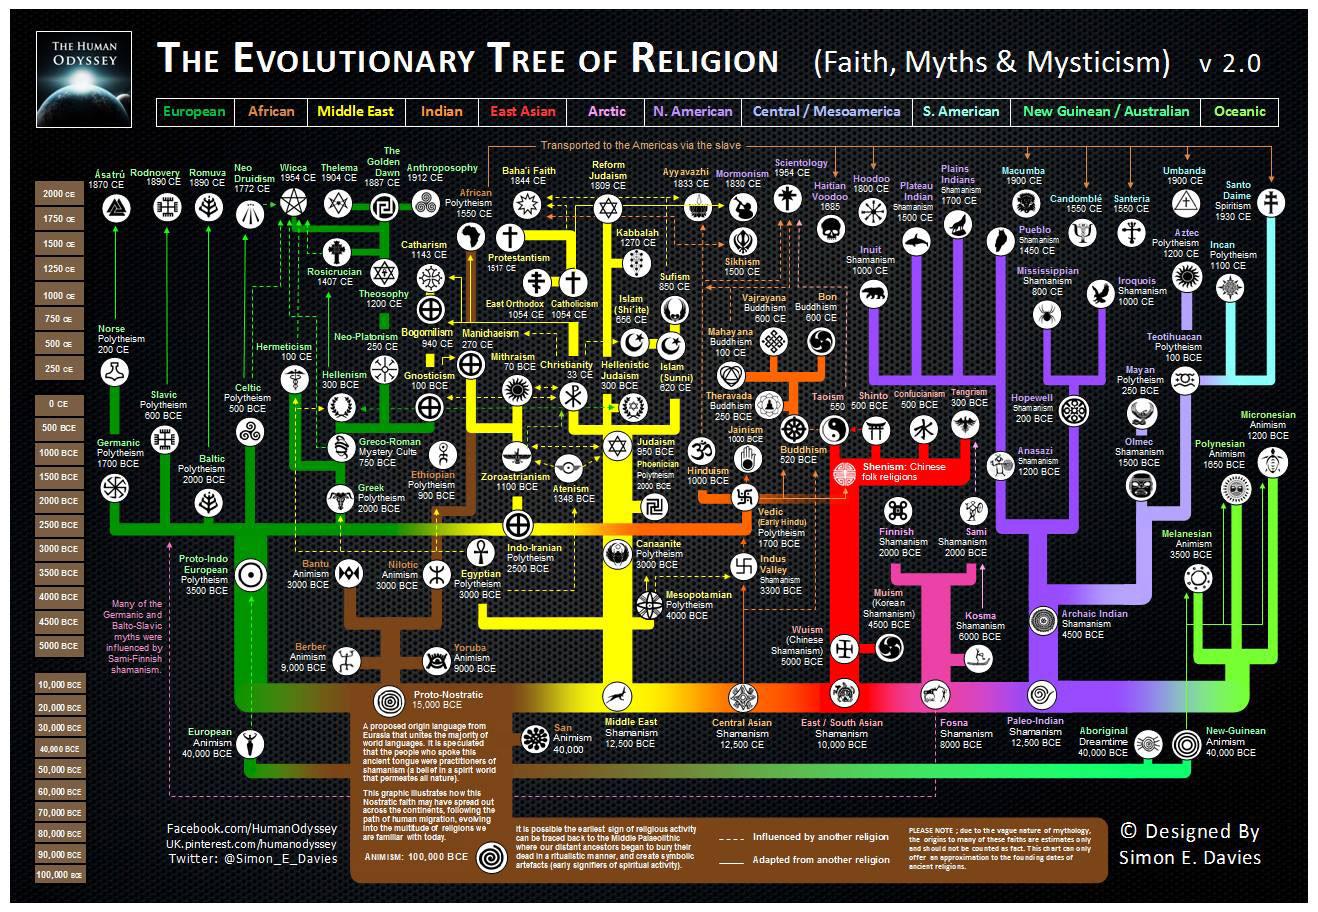 https://i1.wp.com/ultraculture.org/wp-content/uploads/2015/11/evolutionary-tree-religion-2.0.jpg